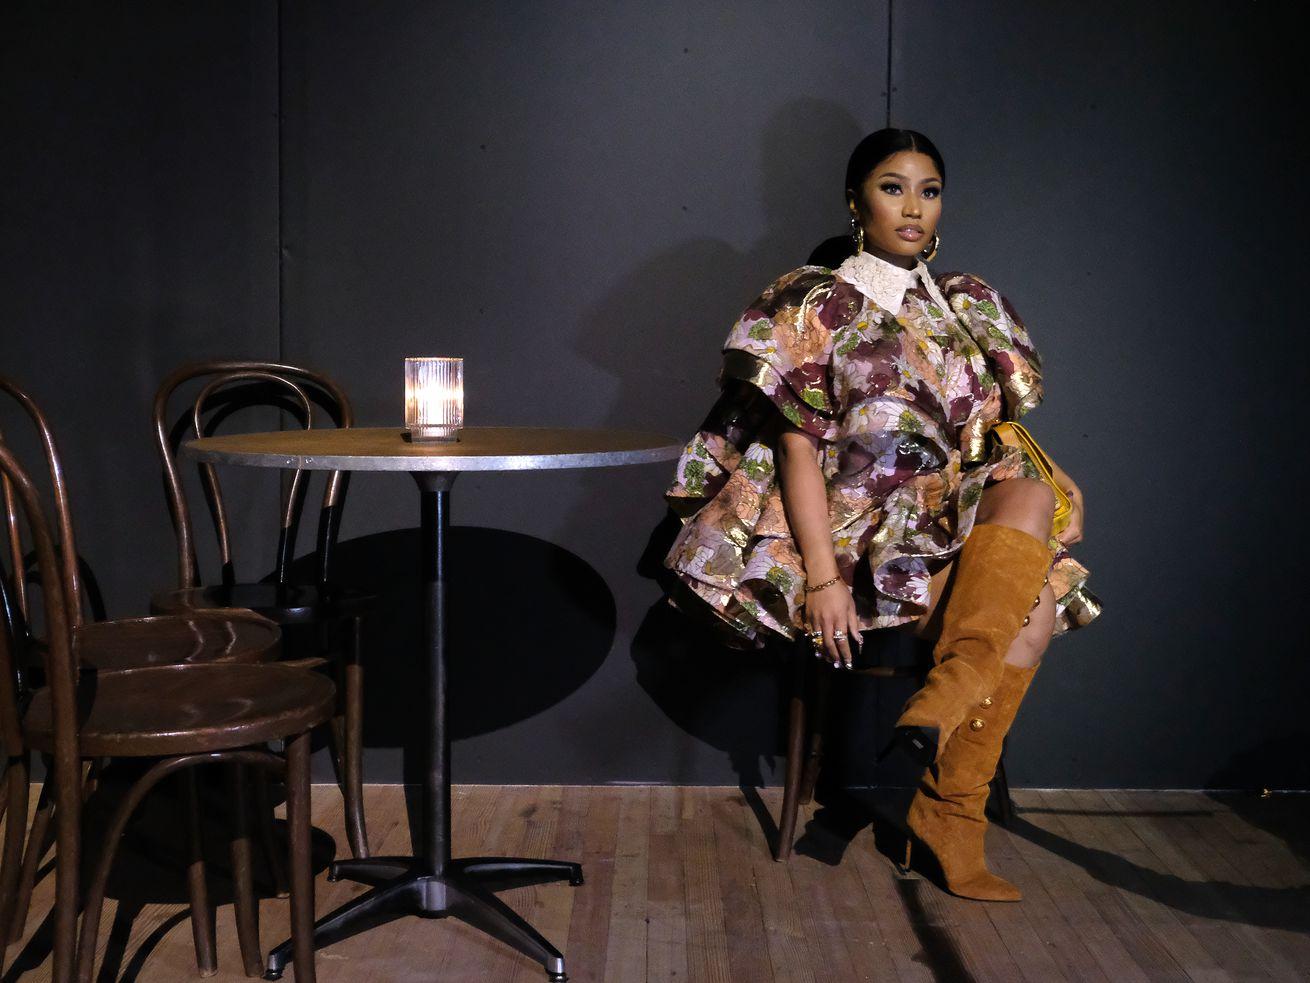 Nicki Minaj sitting alone at a cafe table.